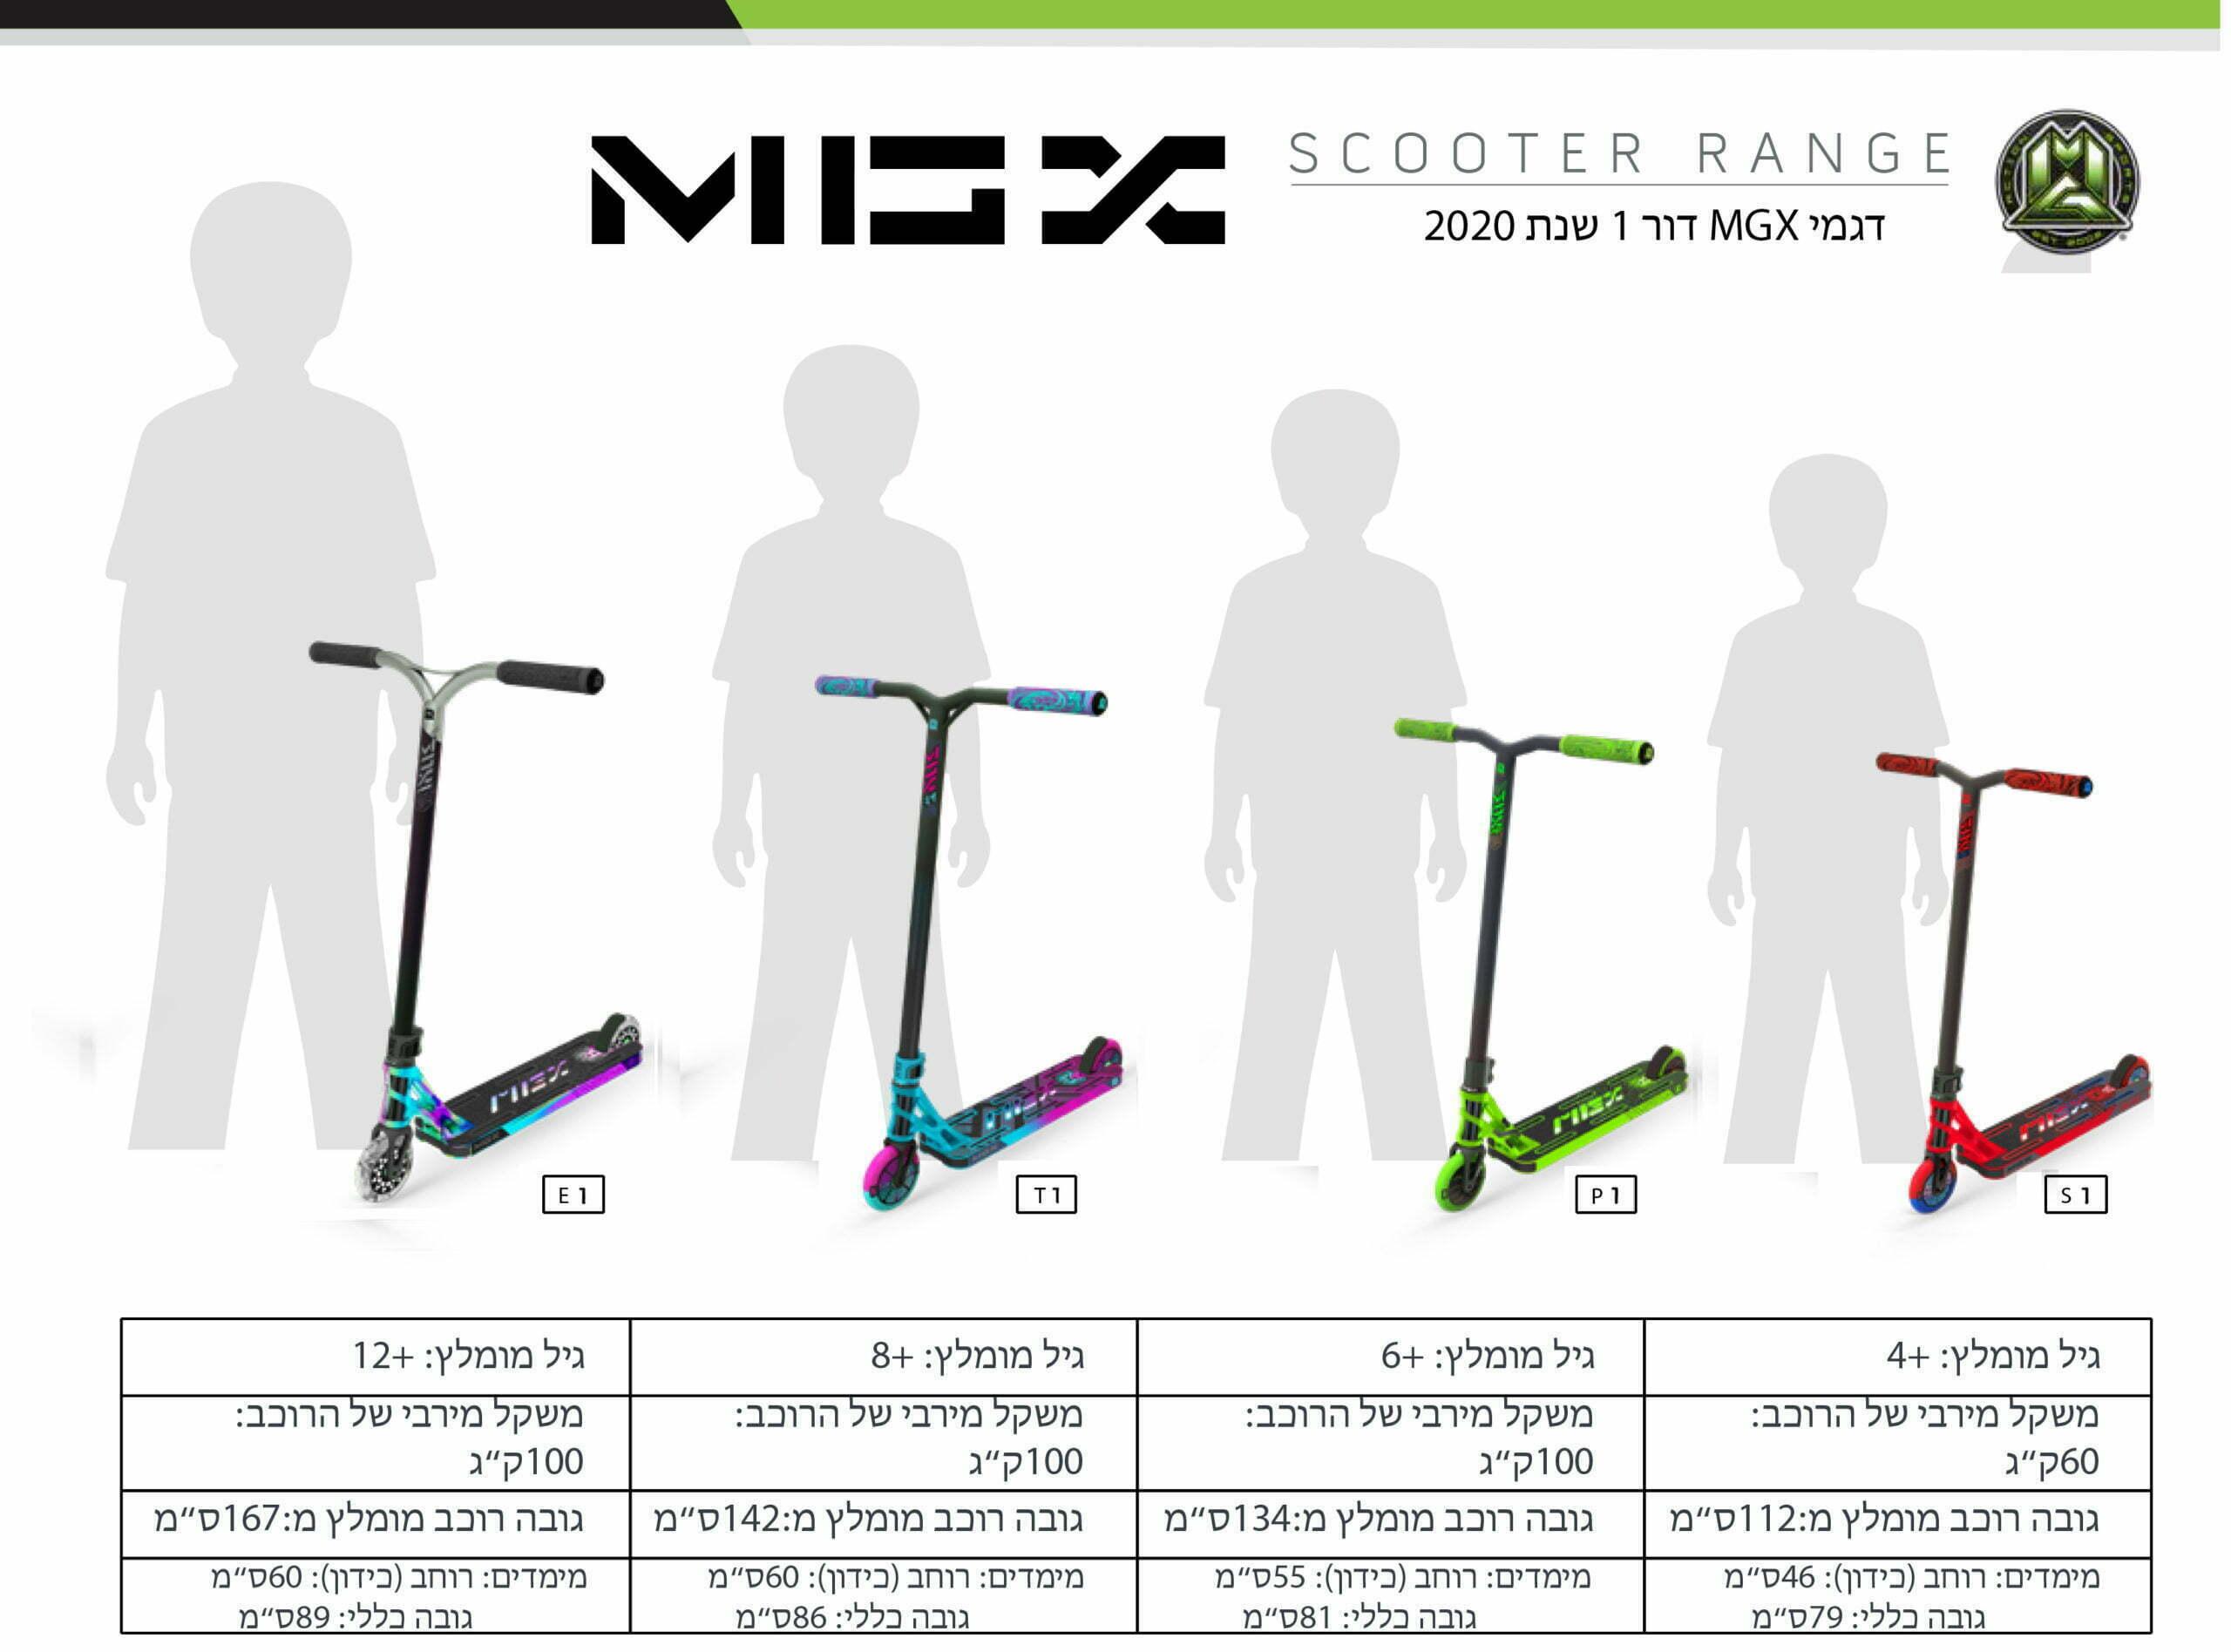 2020 Comparison Chart - MGX - Silhouettes